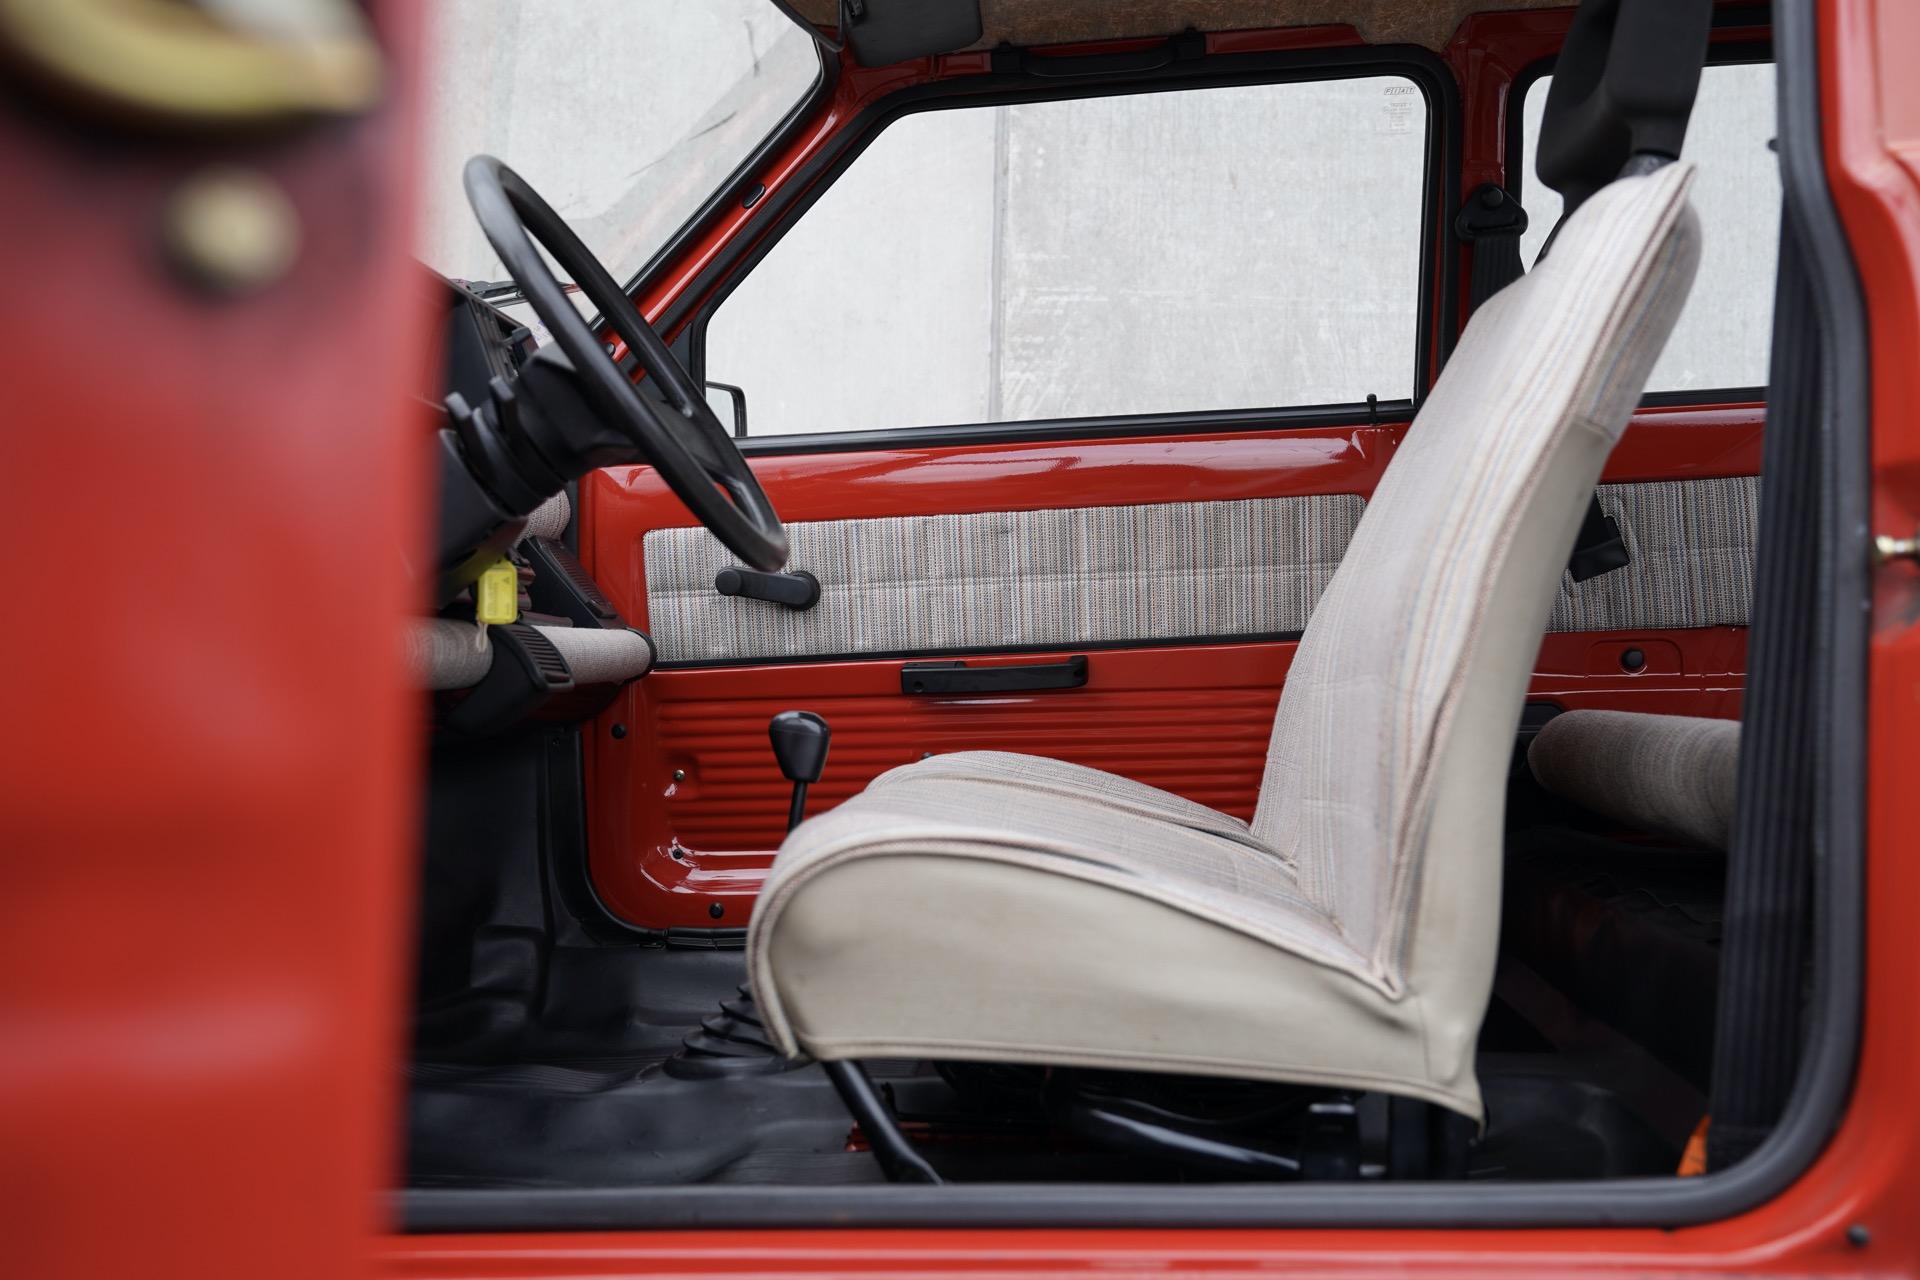 FIAT PANDA 750 L VERKOCHT